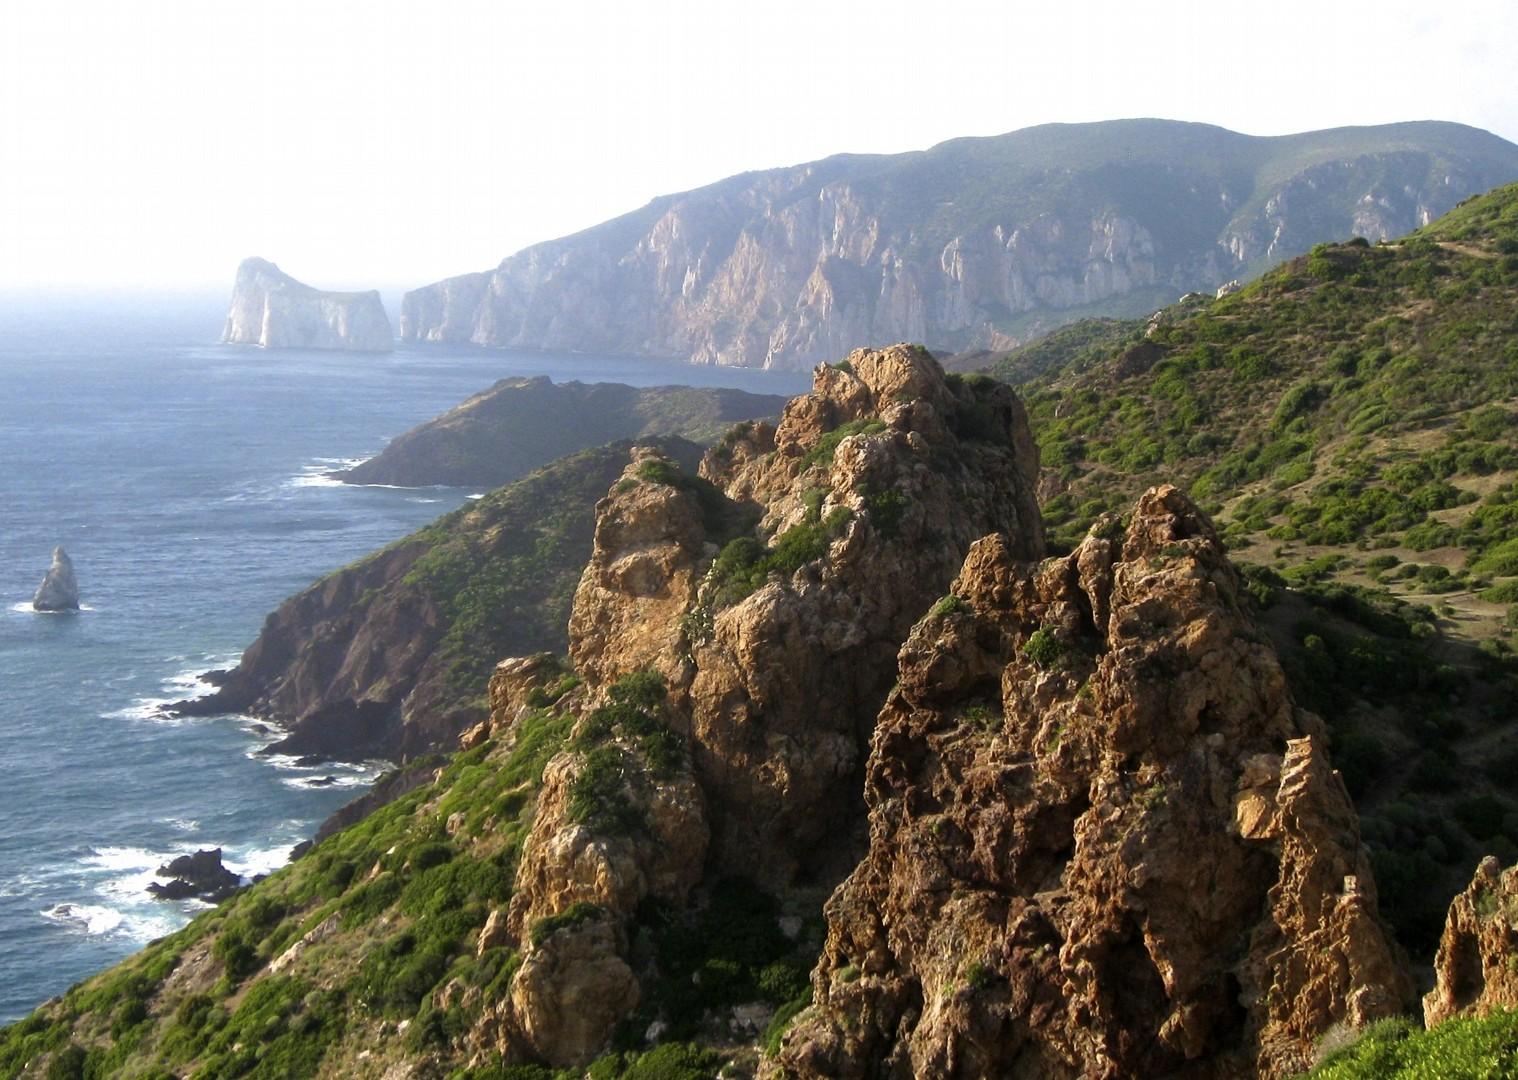 4114689180_782936248c_o.jpg - Sardinia - La Costa Verde - Guided Mountain Bike Holiday - Italia Mountain Biking